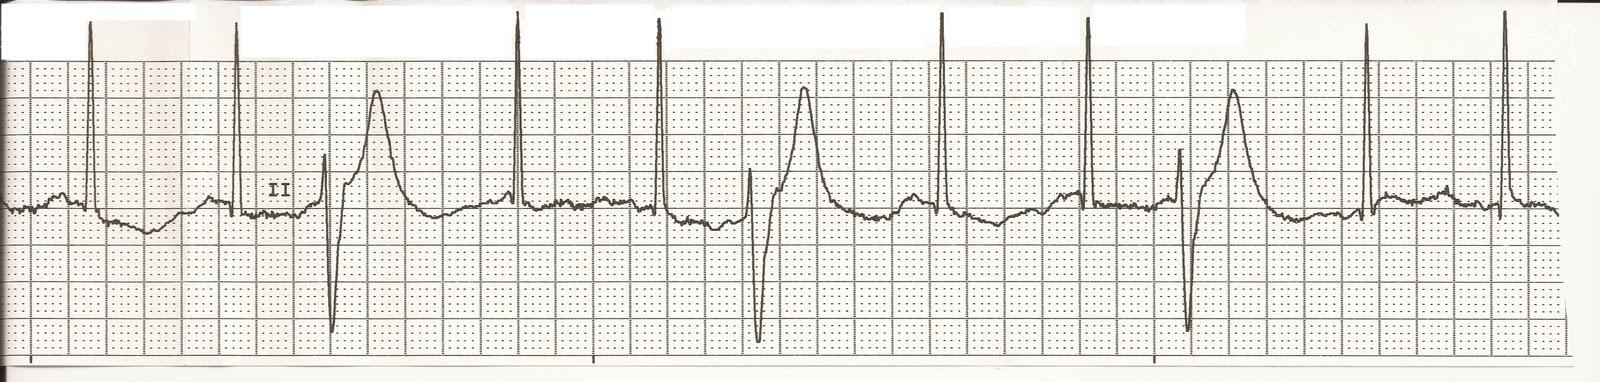 atrial fibrillation research paper